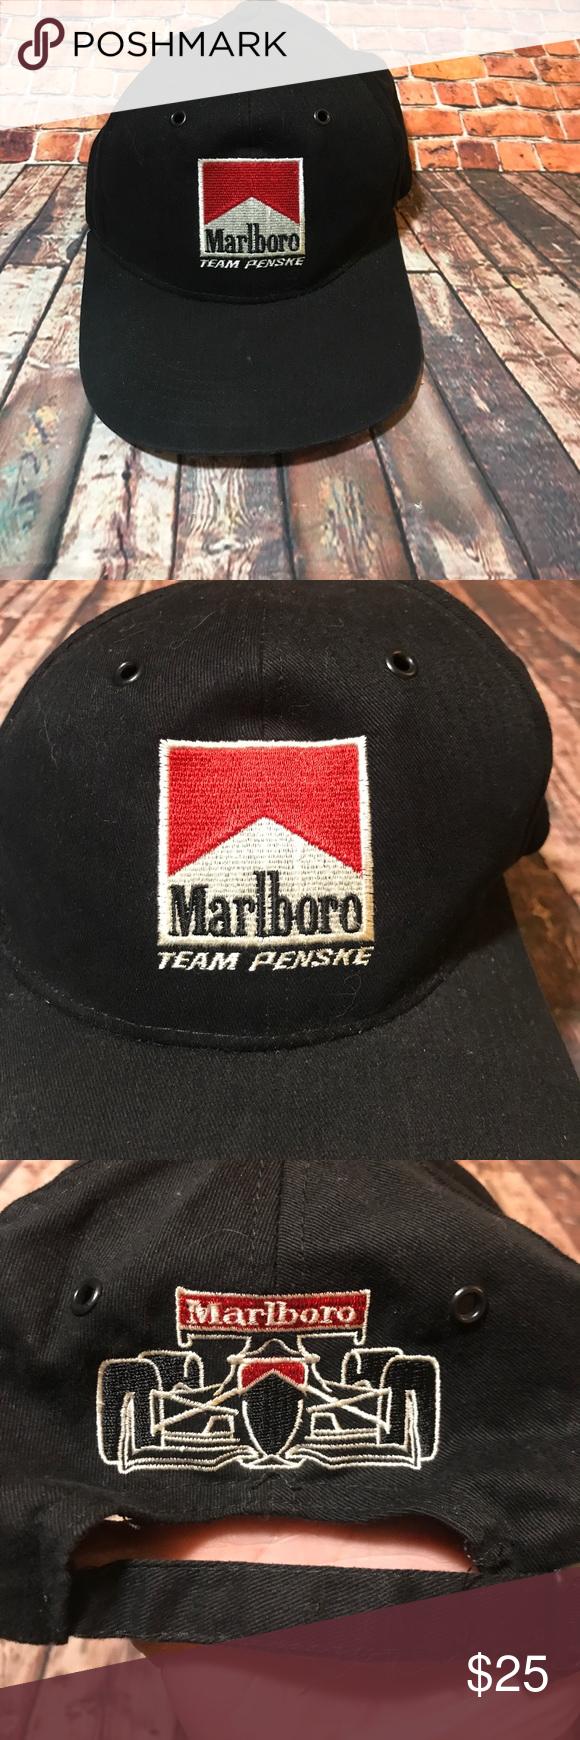 "ac3fdbc04cc1e Vntg Marlboro dad cap trendy Penske hat racing Vintage OS ""fits most"" black  Marlboro"